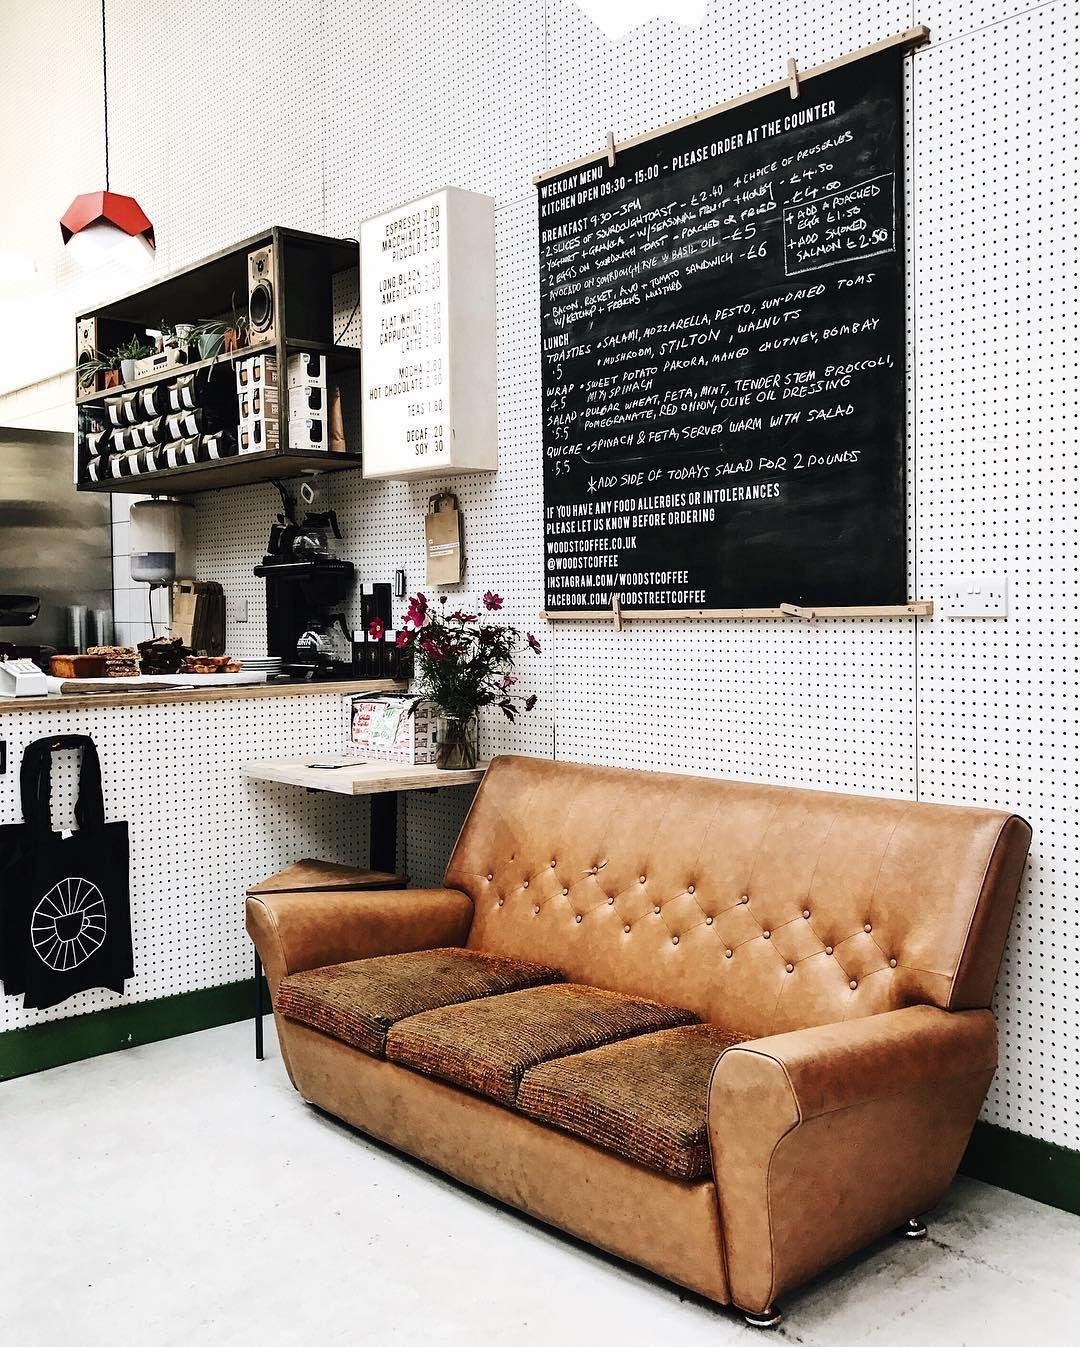 Wood Street Coffee Walthamstow London Photo Elice F On